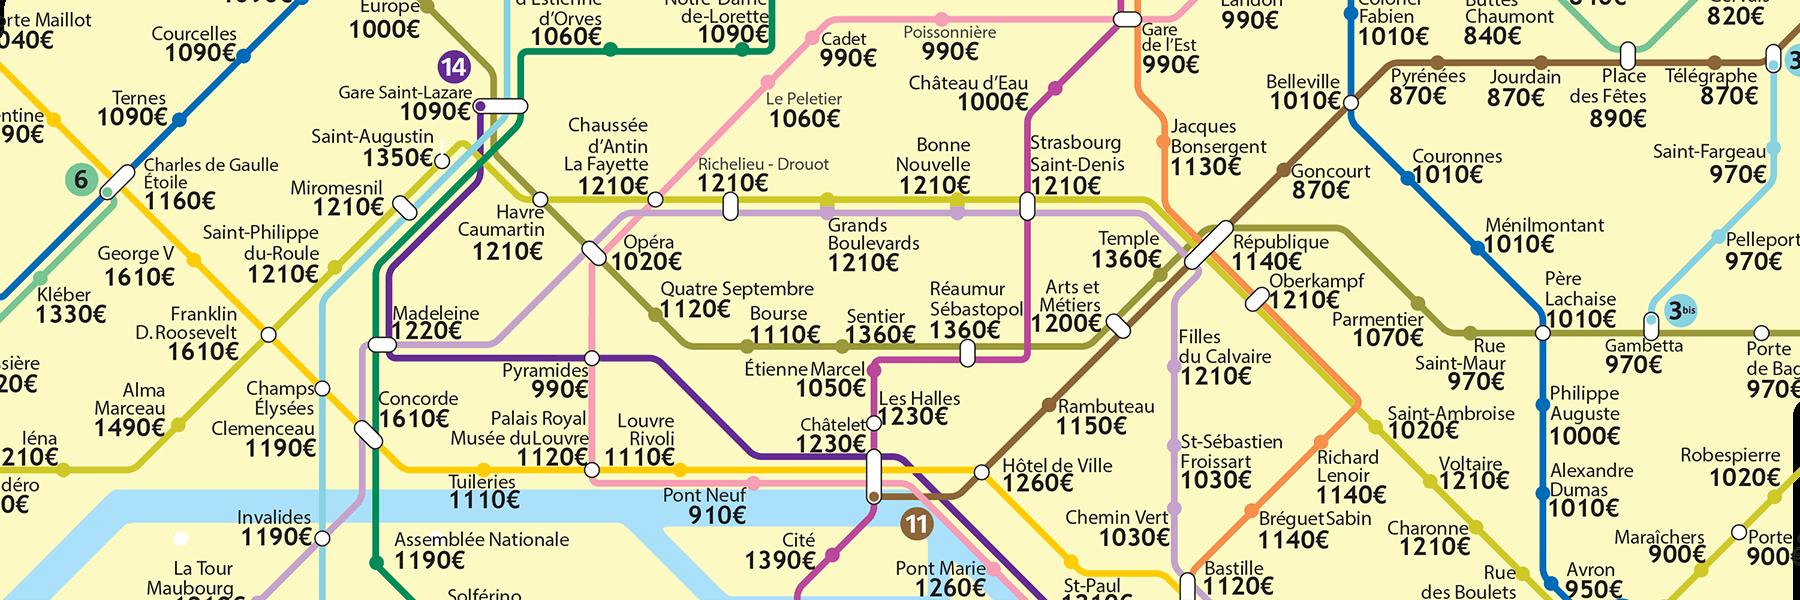 loyer-metro-paris